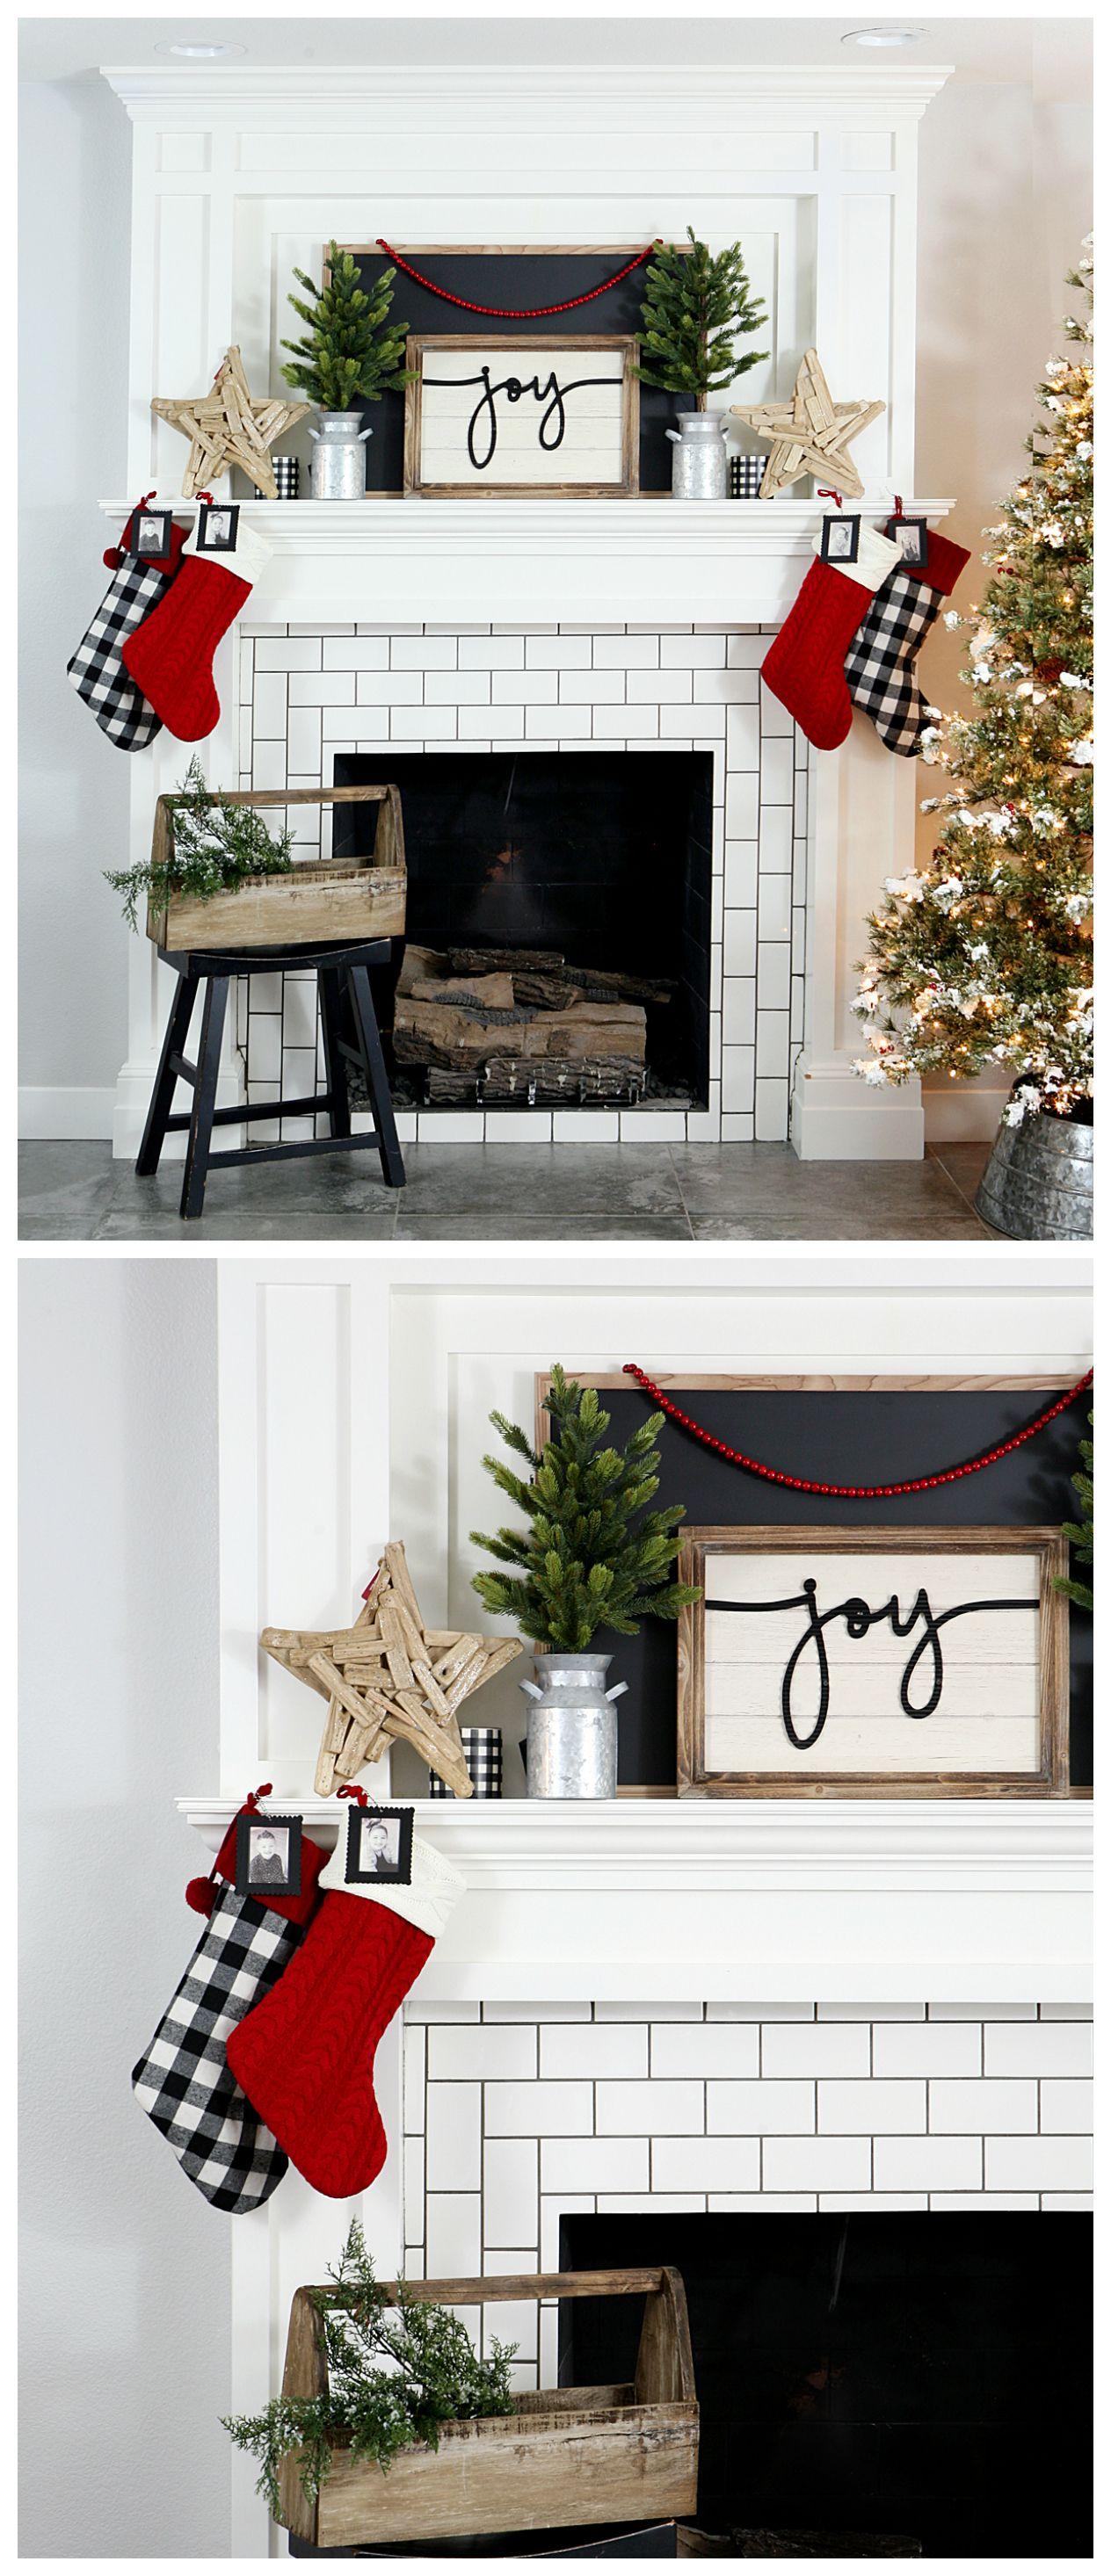 Farmhouse Christmas Mantel | DIY & Crafts | Pinterest | Christmas ...